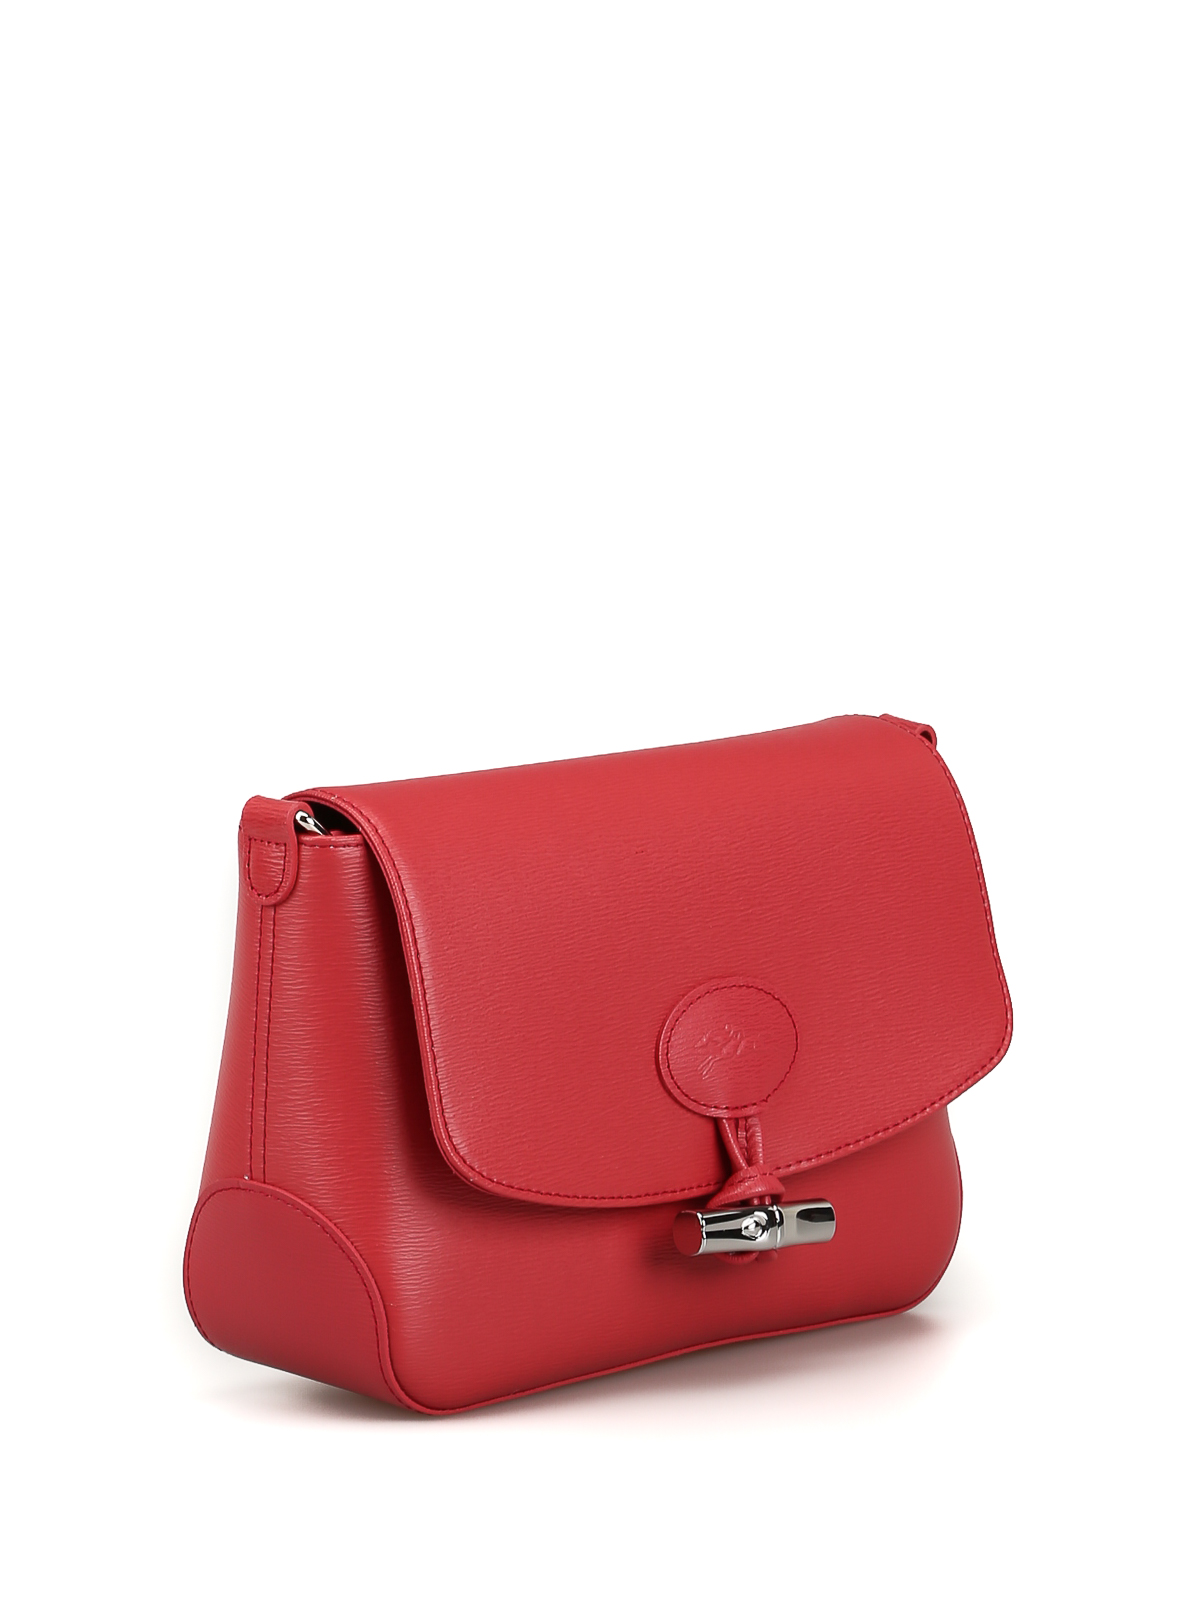 Longchamp - Roseau red leather cross body bag - cross body bags ...